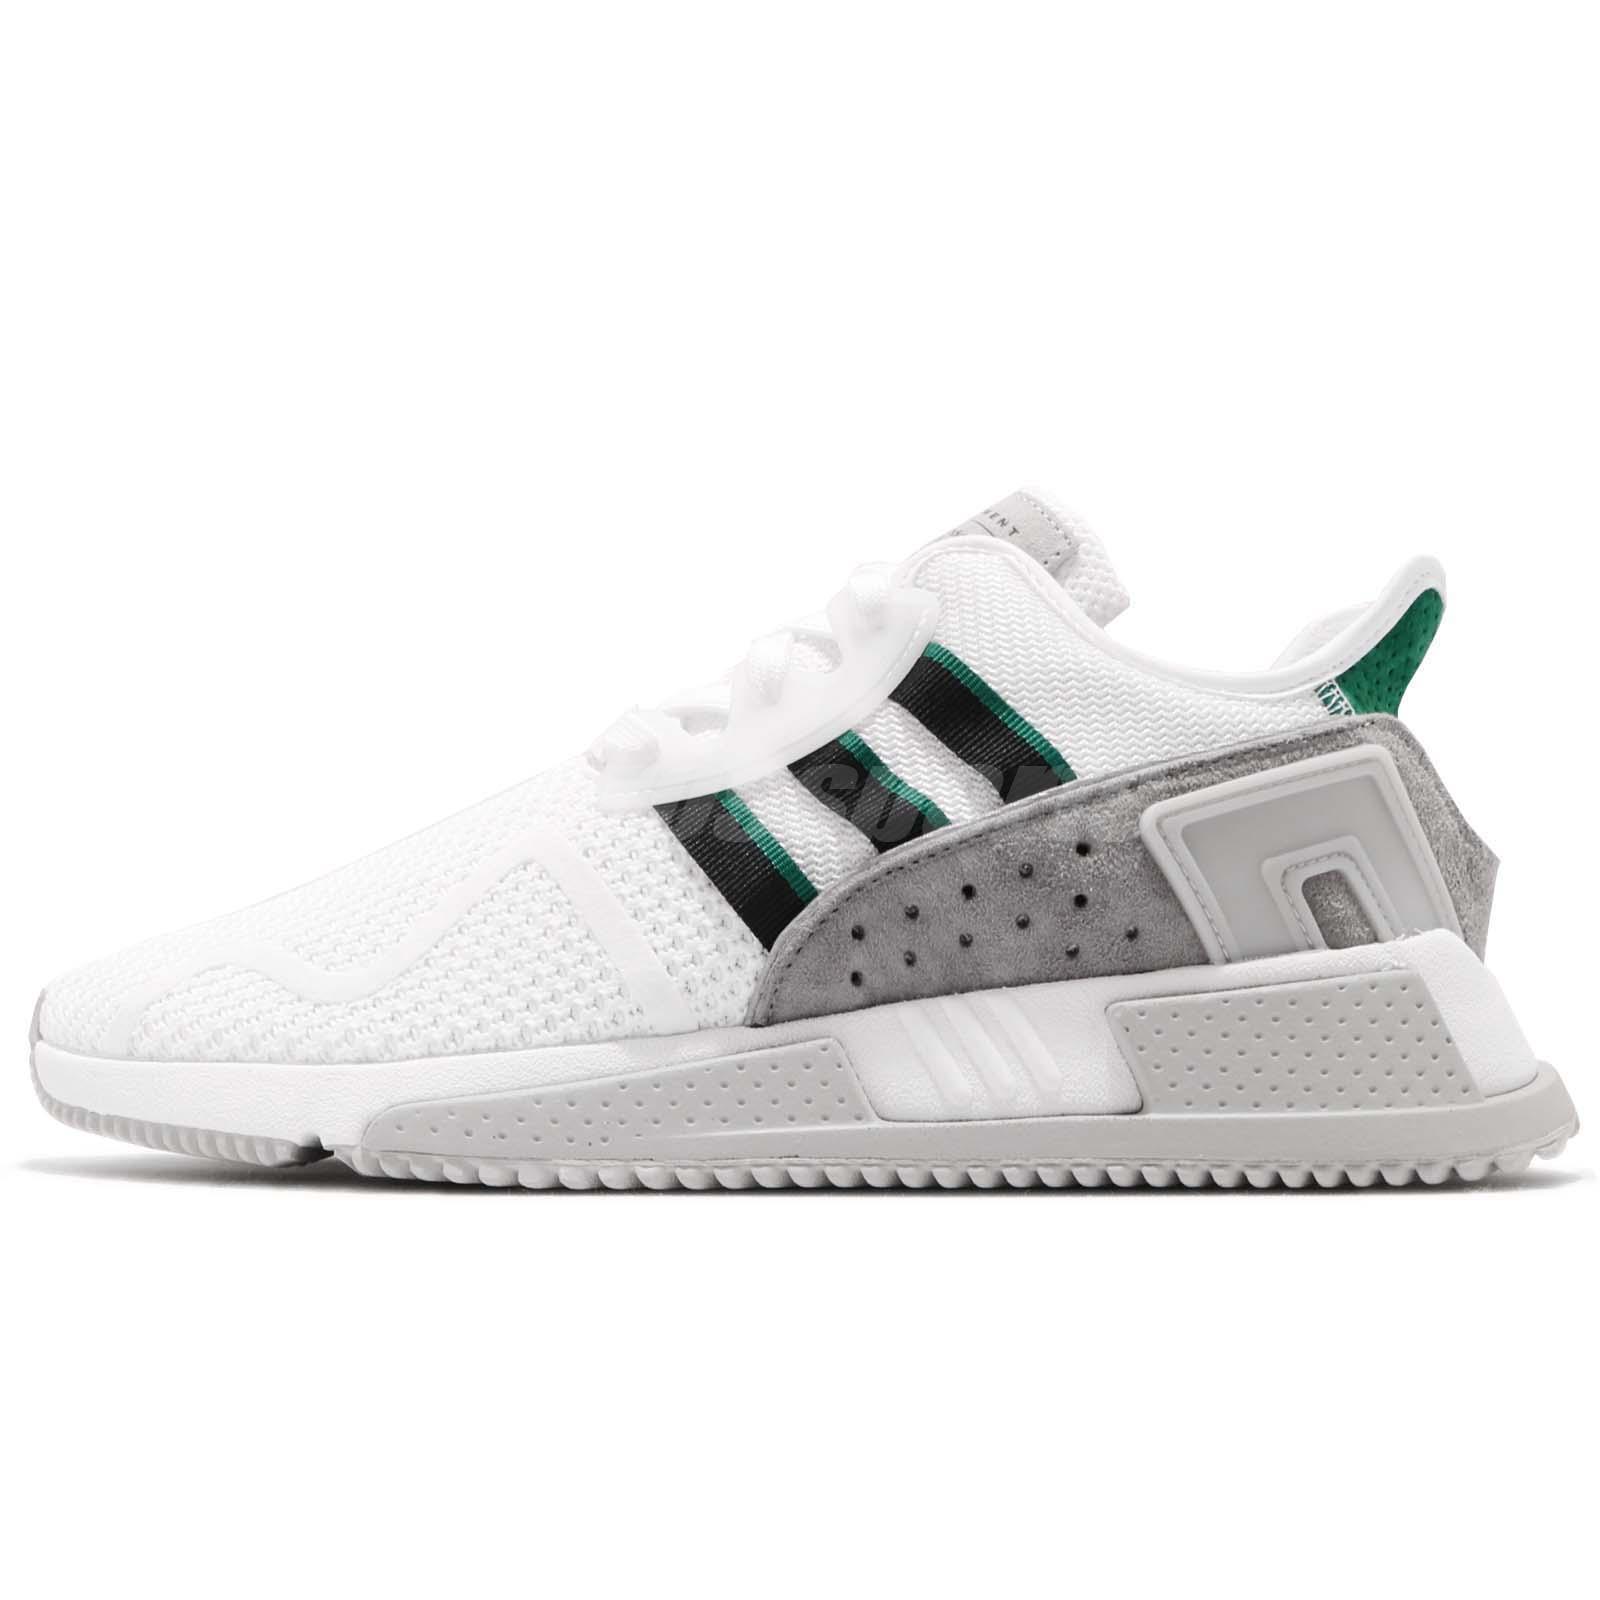 promo code edd6b eb118 adidas Originals EQT Cushion ADV White Grey Green Men Running Casual Shoe  BB7178